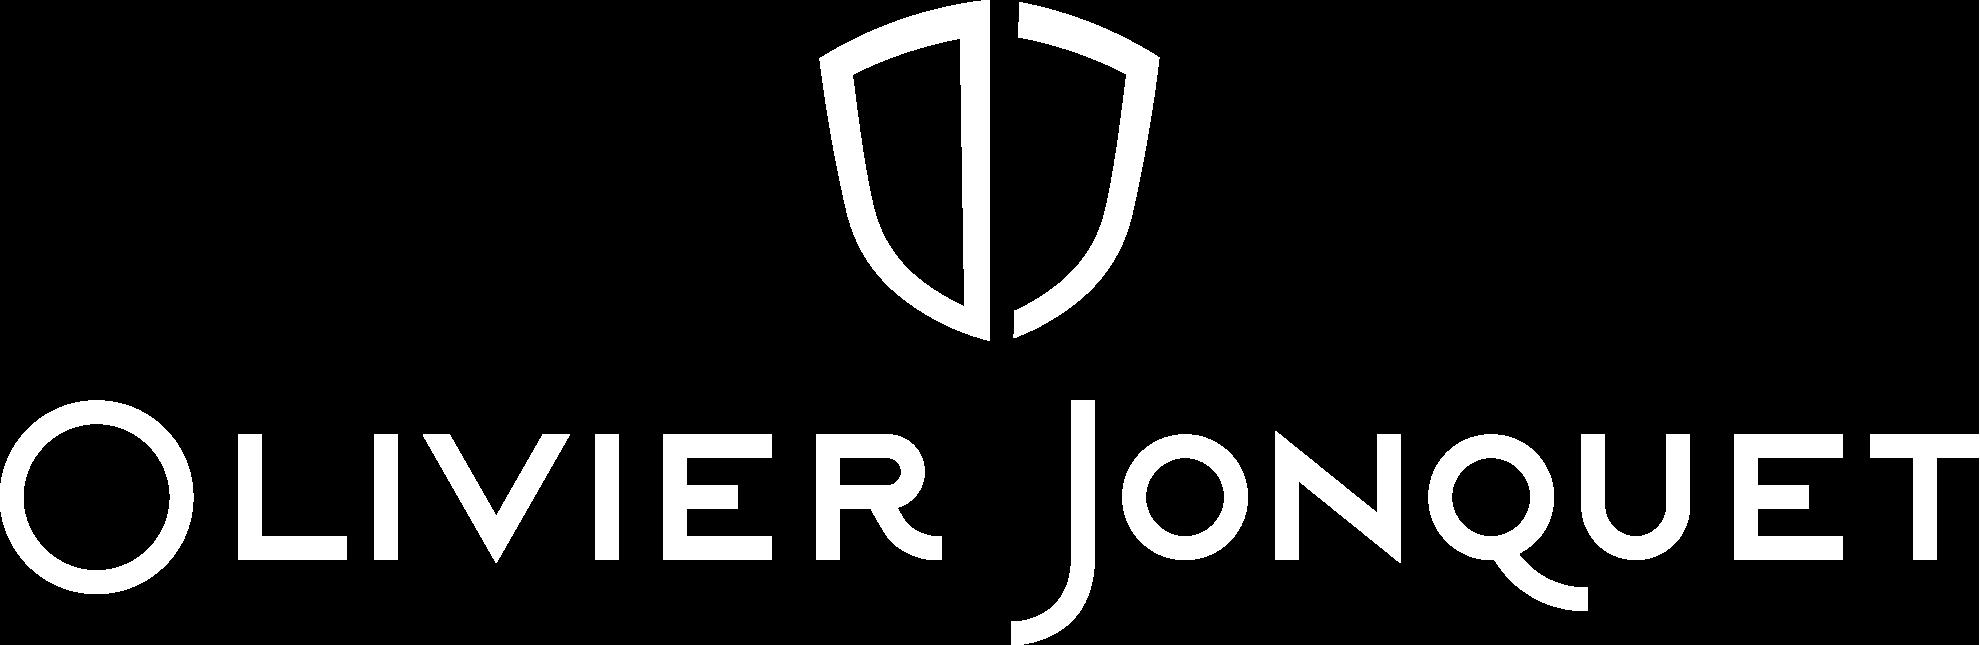 Montres Olivier Jonquet Logo